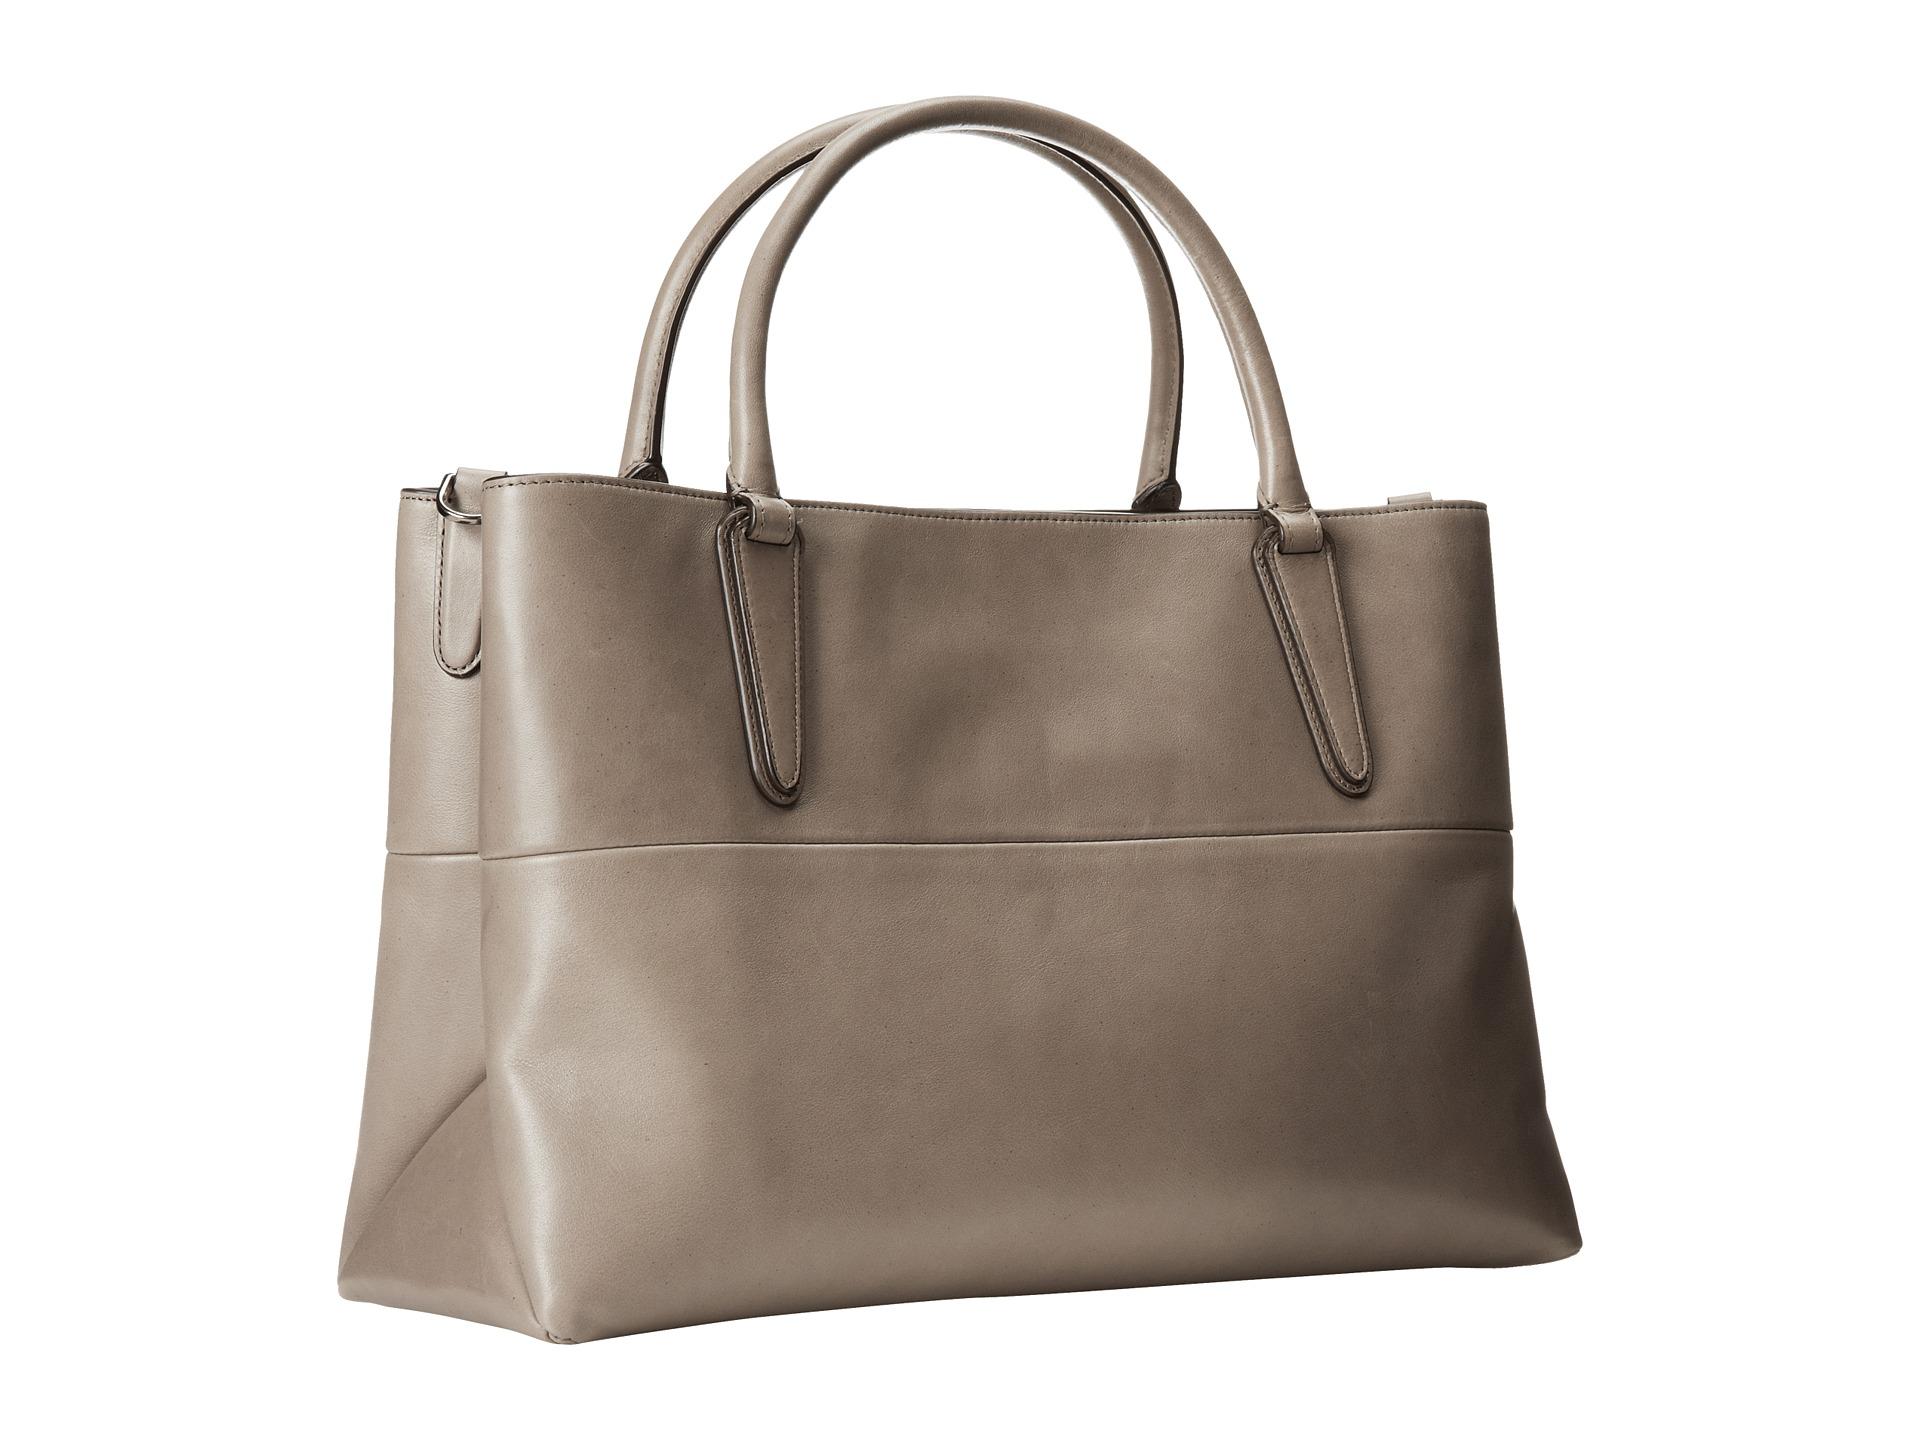 coach soft borough bag nappa leather shipped free at zappos